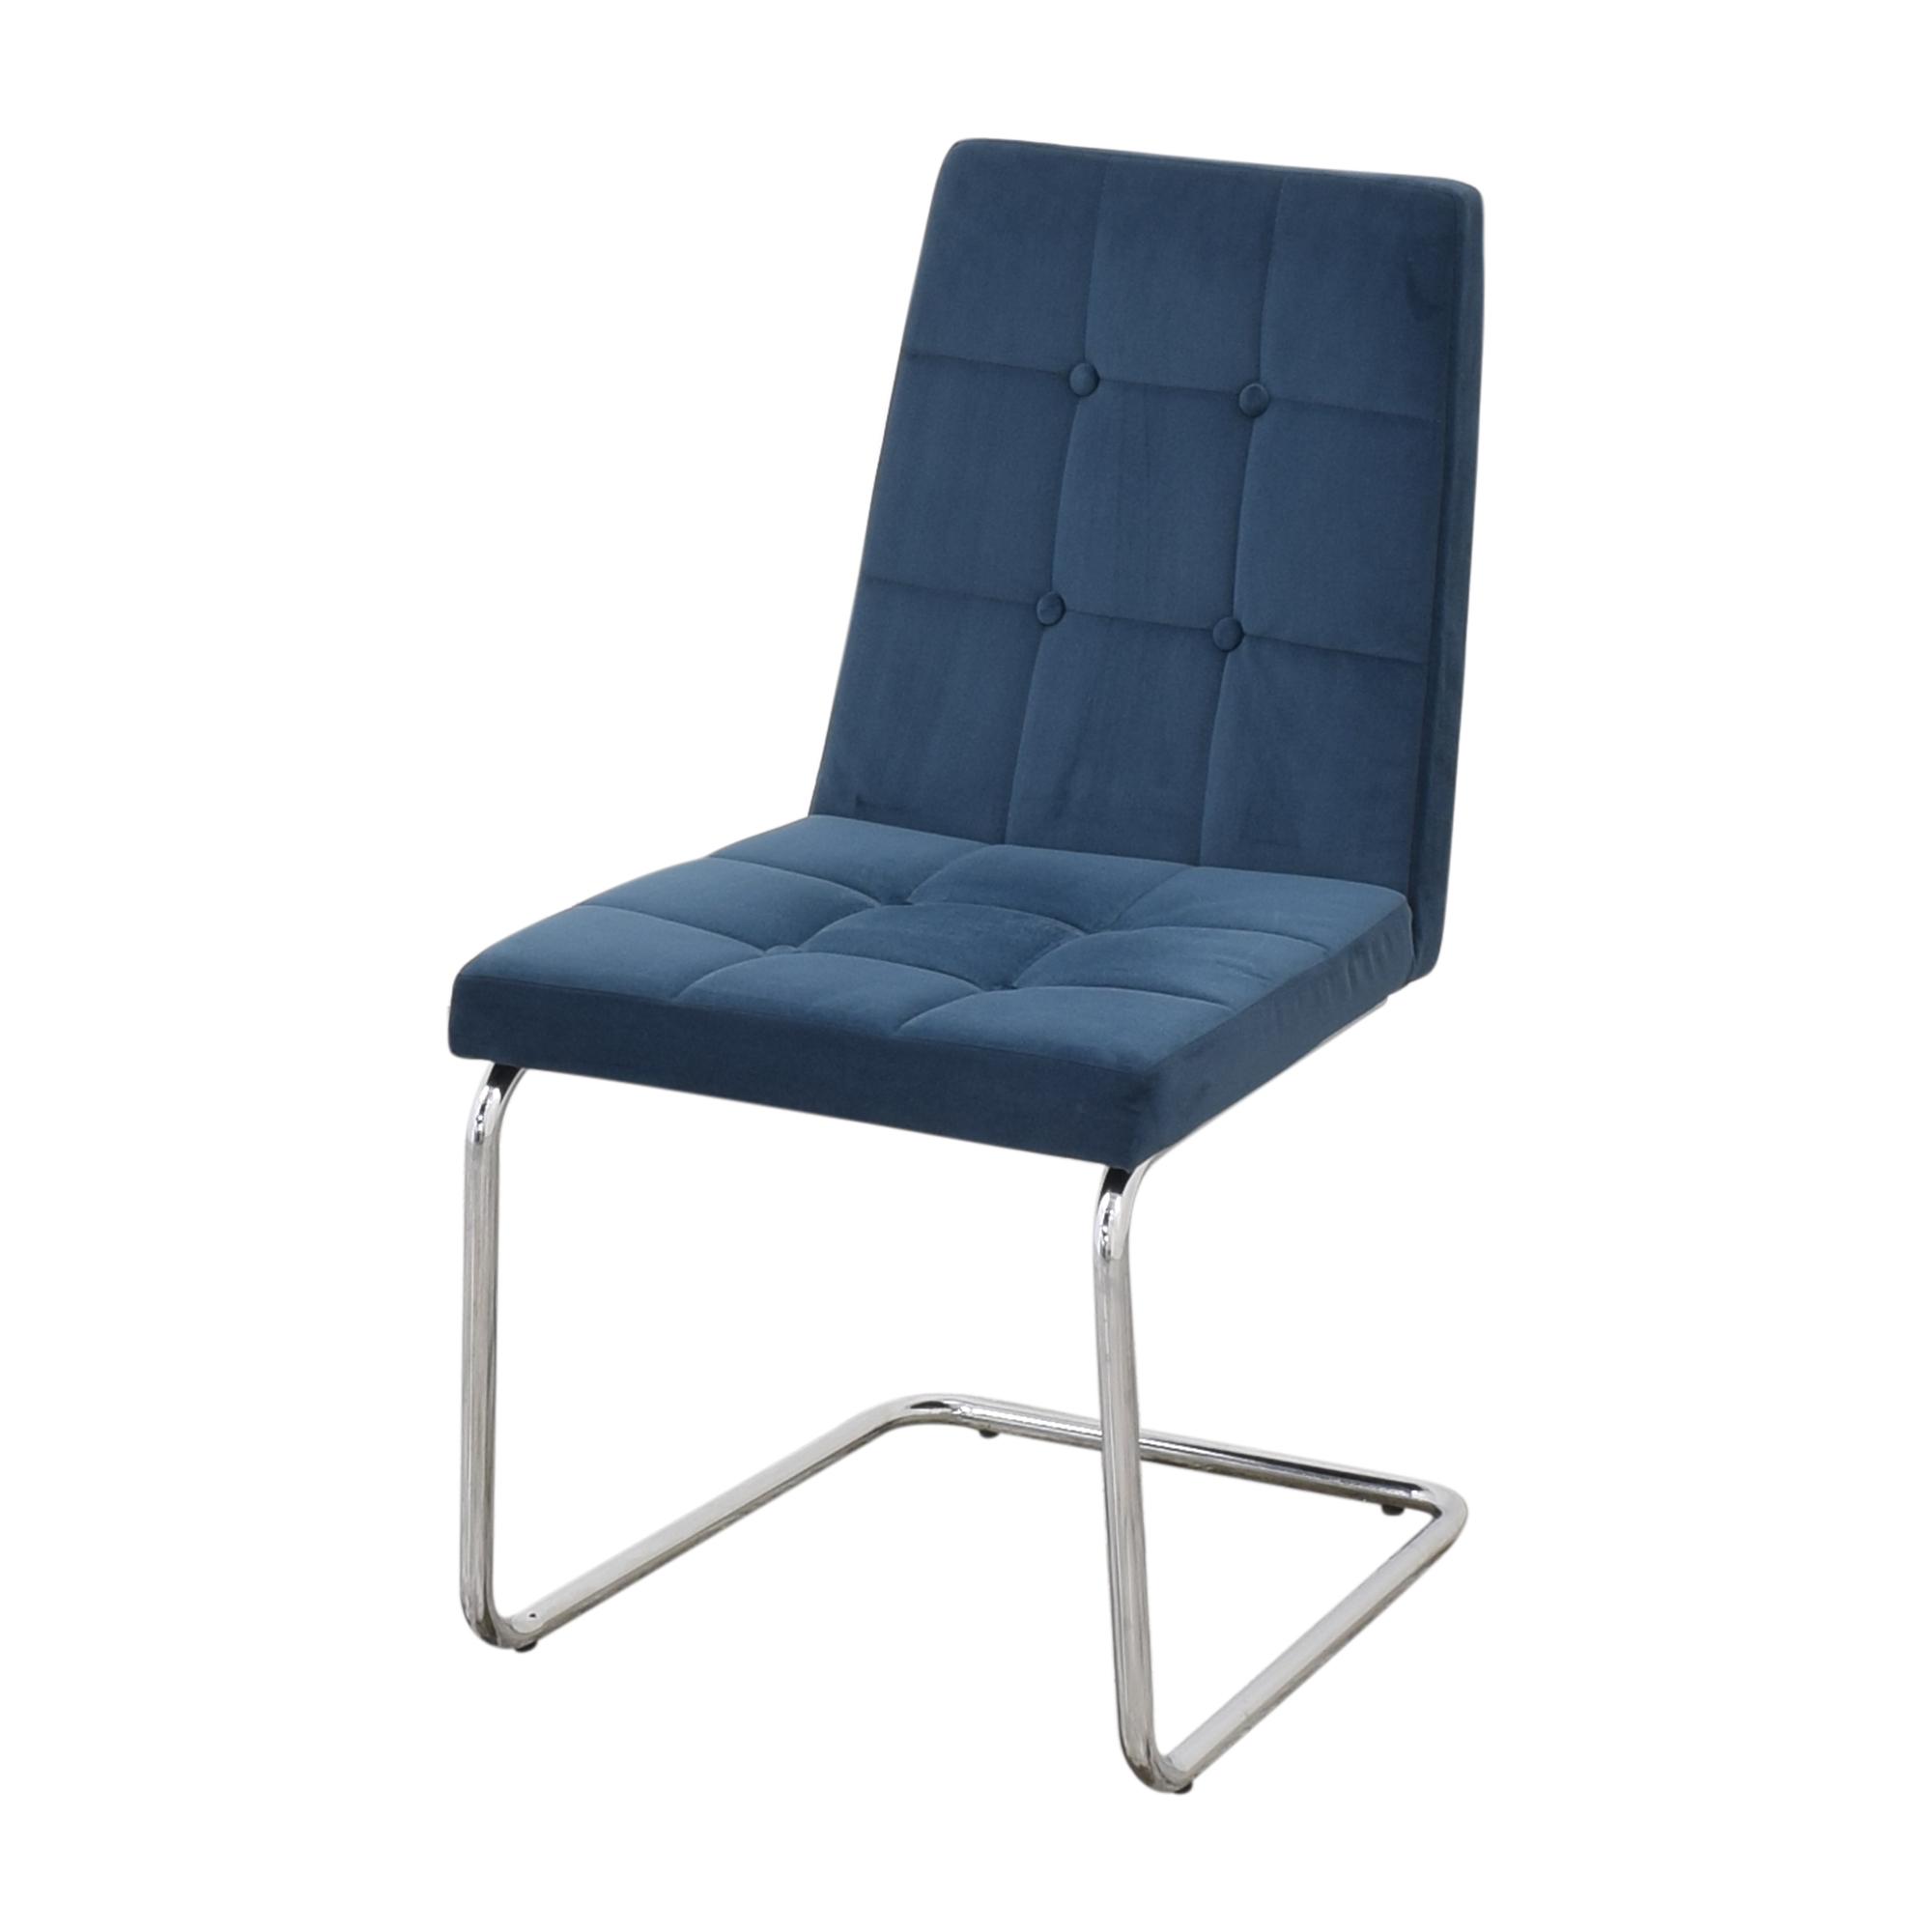 CB2 CB2 Roya Chairs Slate Blue for sale